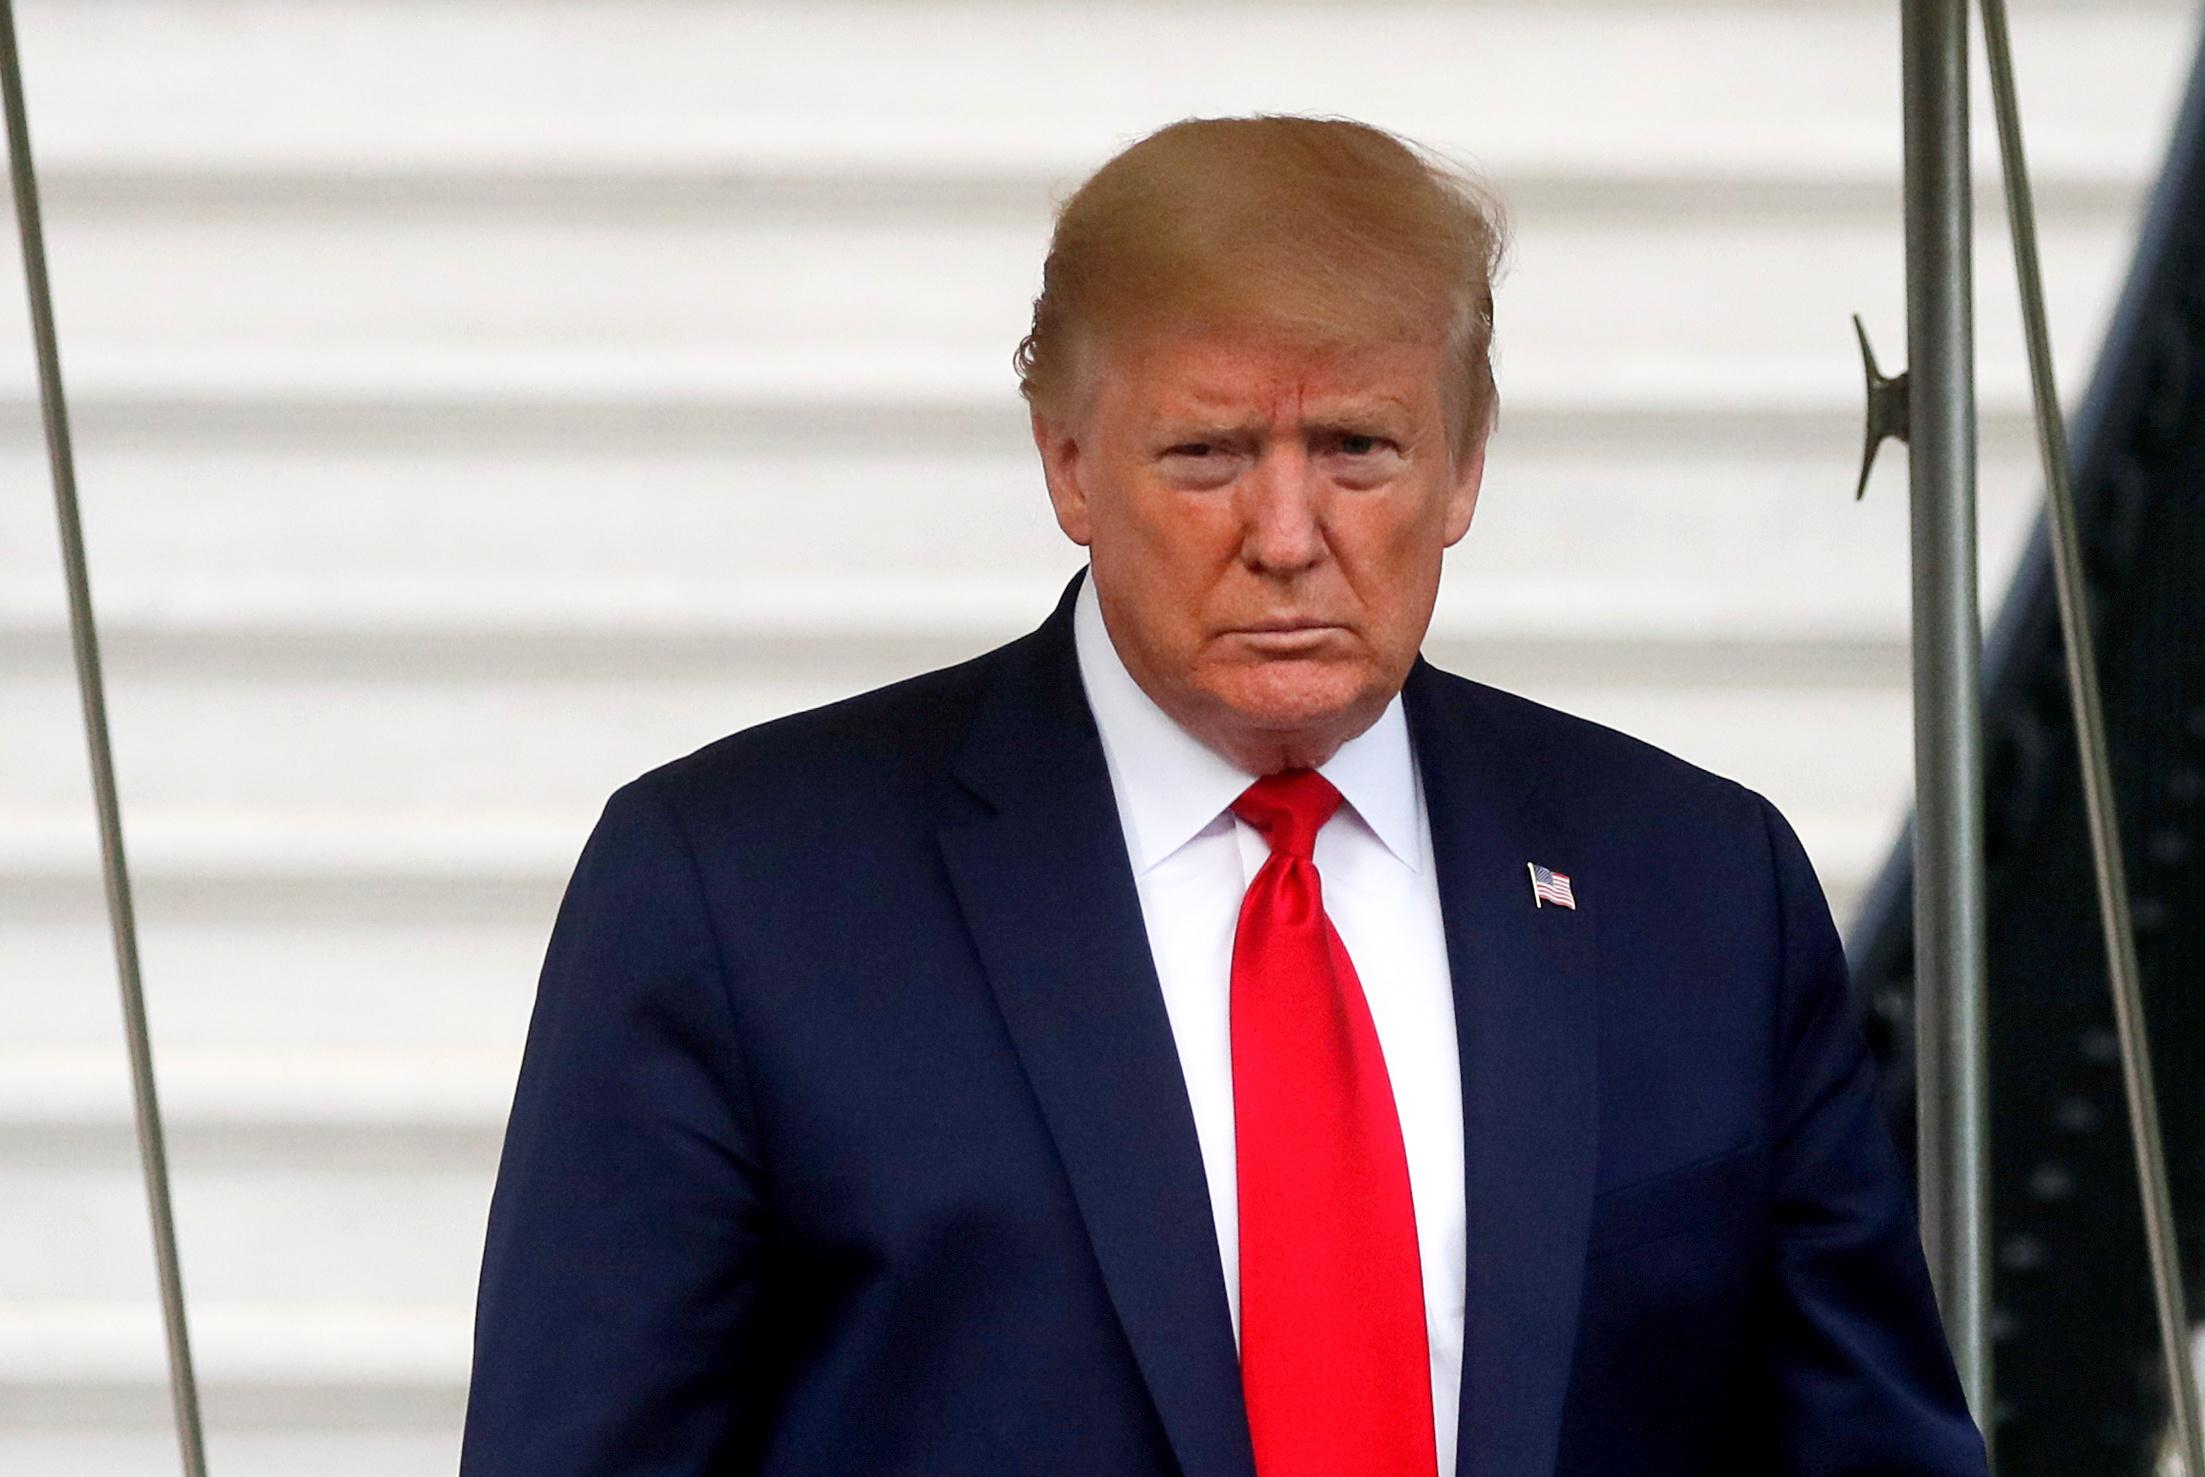 U.S. President Trump